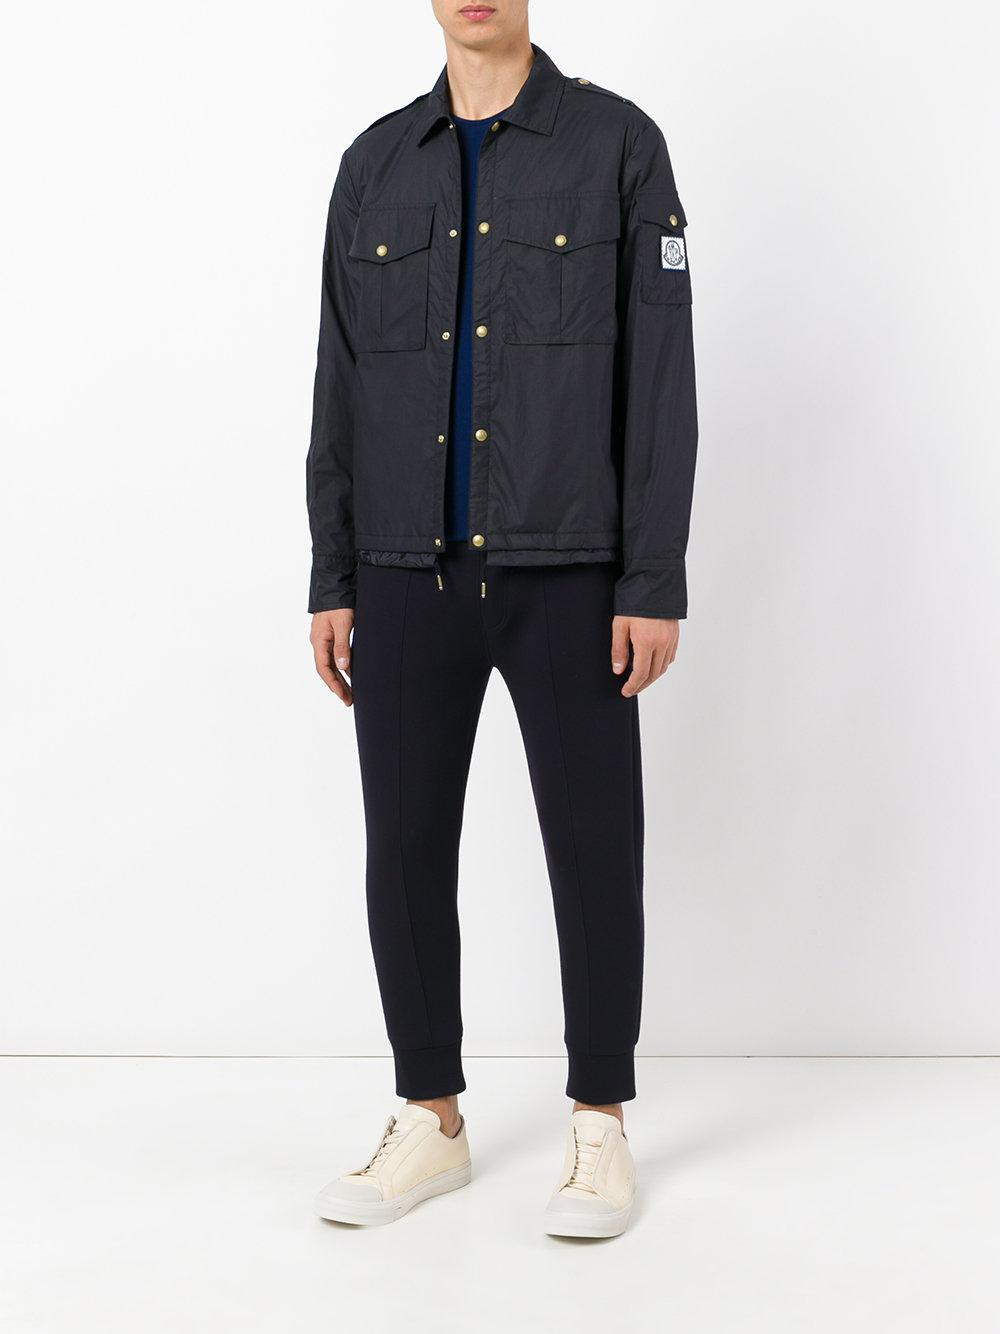 Moncler Gamme Bleu Cotton Snap Button Jacket in Blue for Men